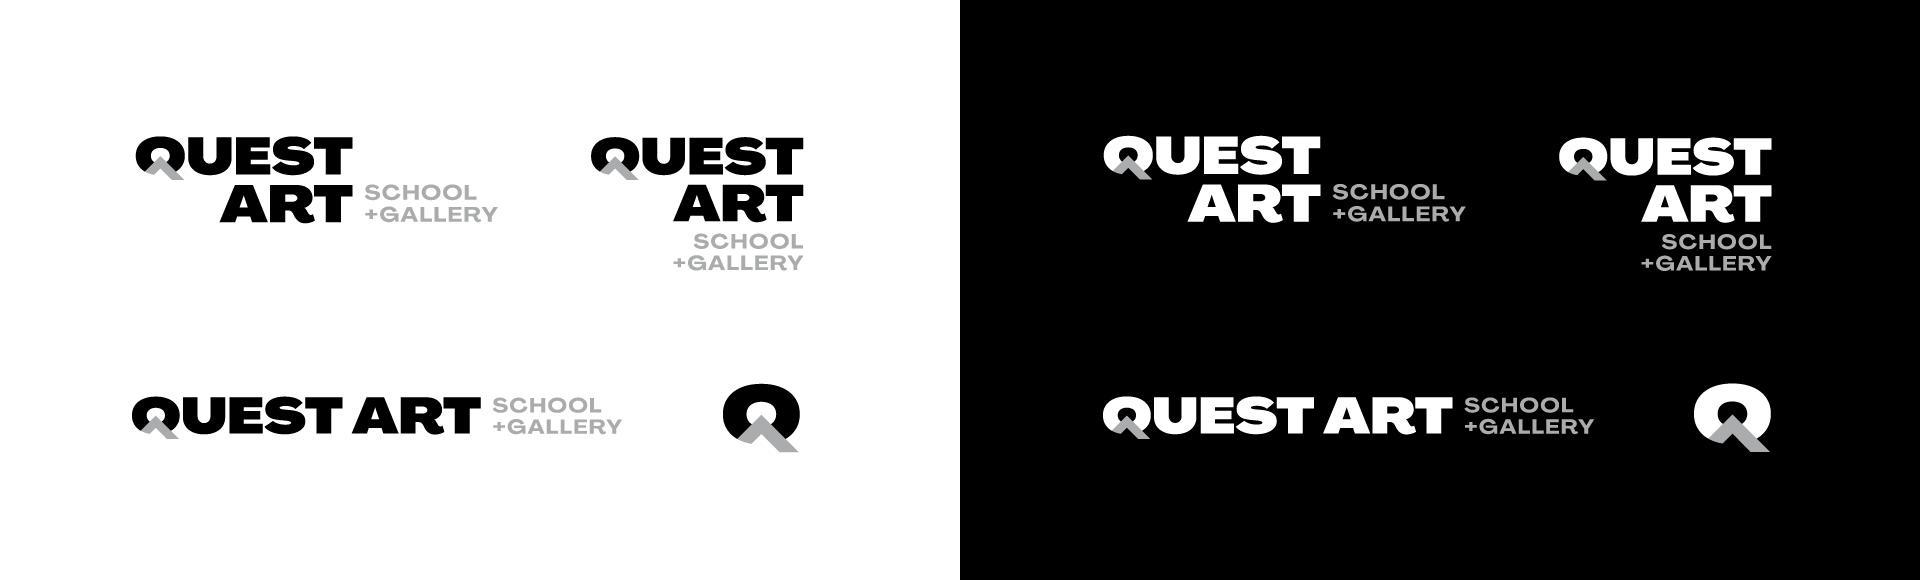 quest art school and gallery corporate branding logo variations